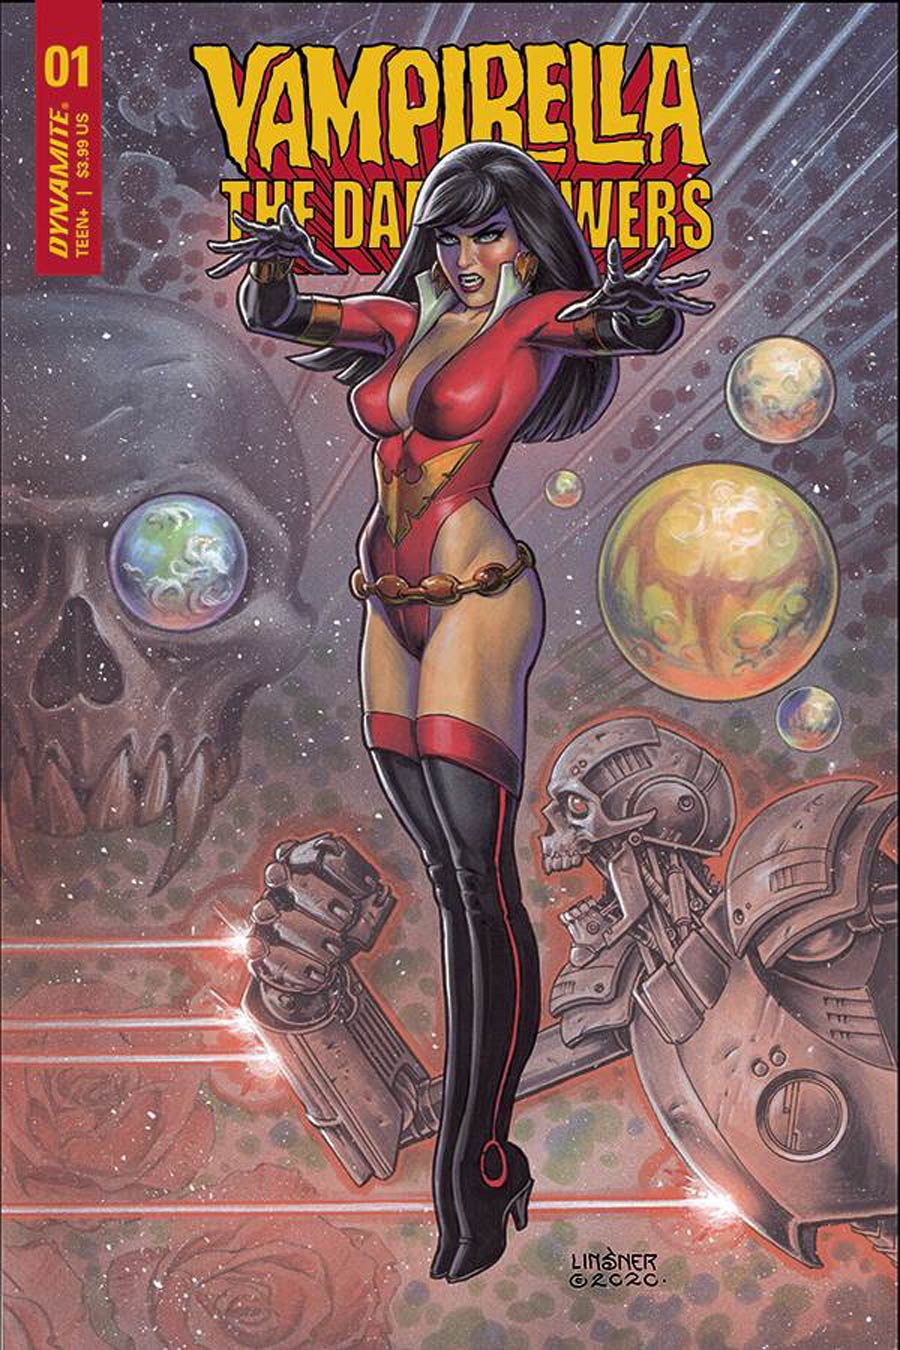 Vampirella The Dark Powers #1 Cover C Variant Joseph Michael Linsner Cover